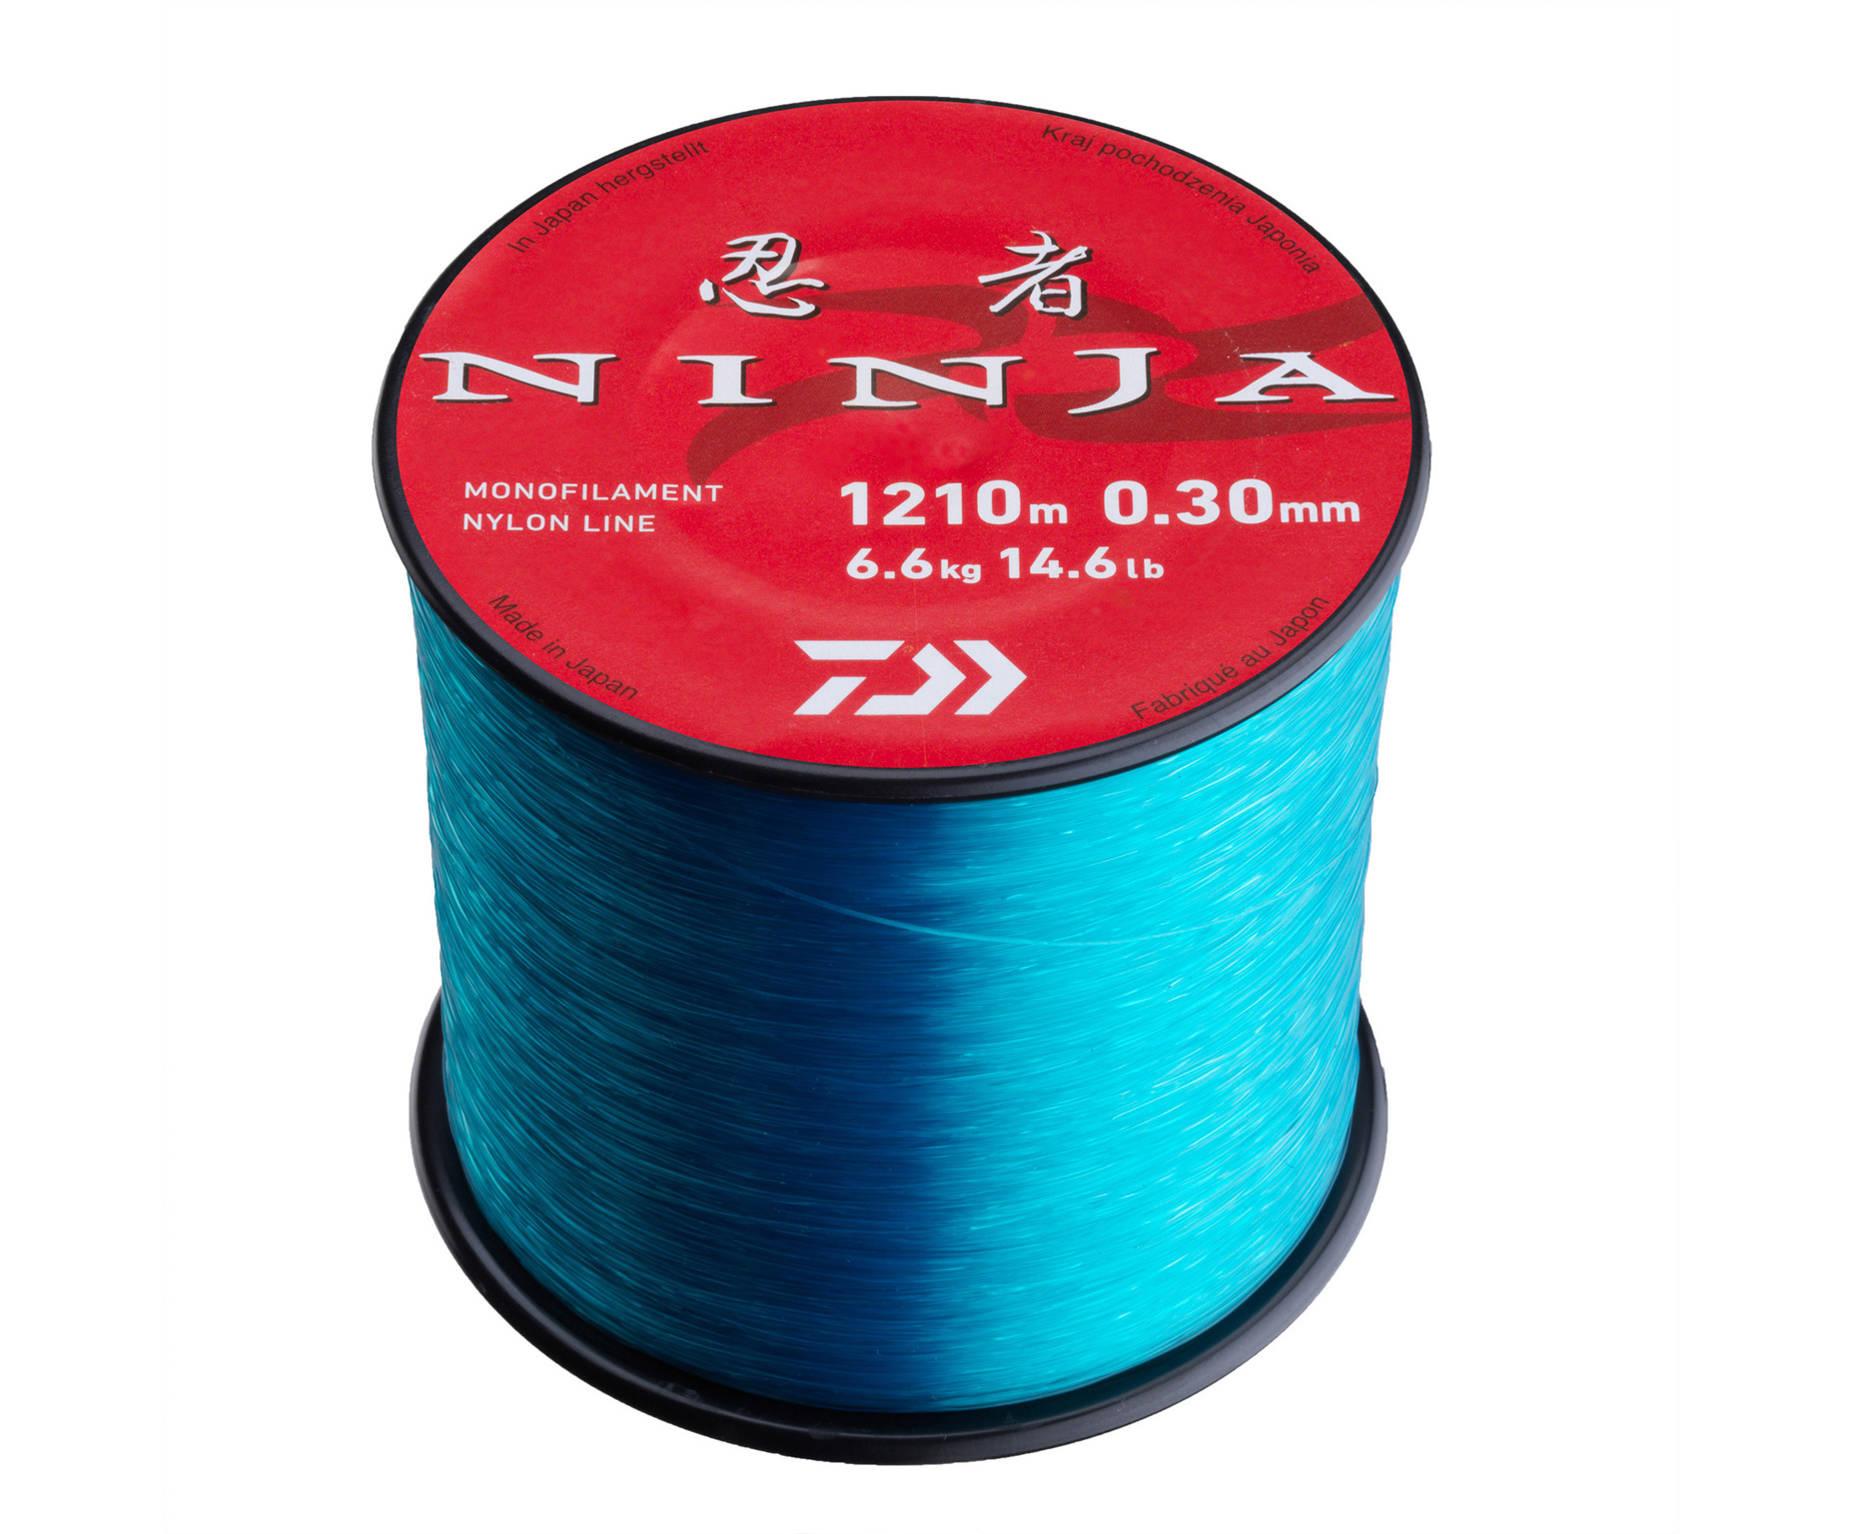 Daiwa ¯y³ka Ninja X Mono - 2250m 0.23mm 3.9kg